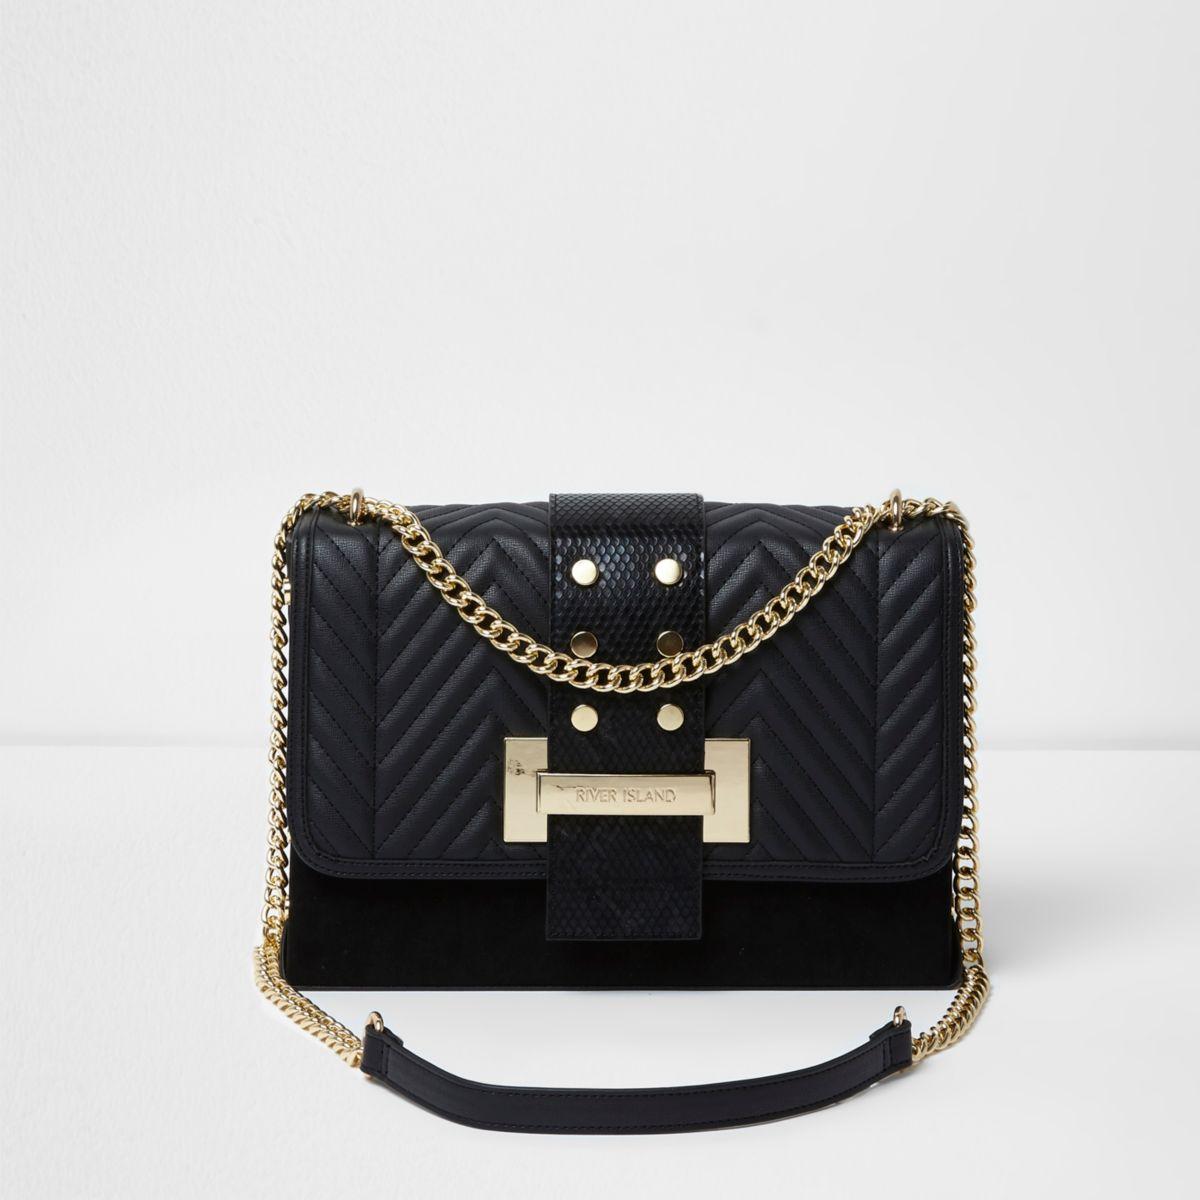 Zwarte doorgestikte tas met ketting